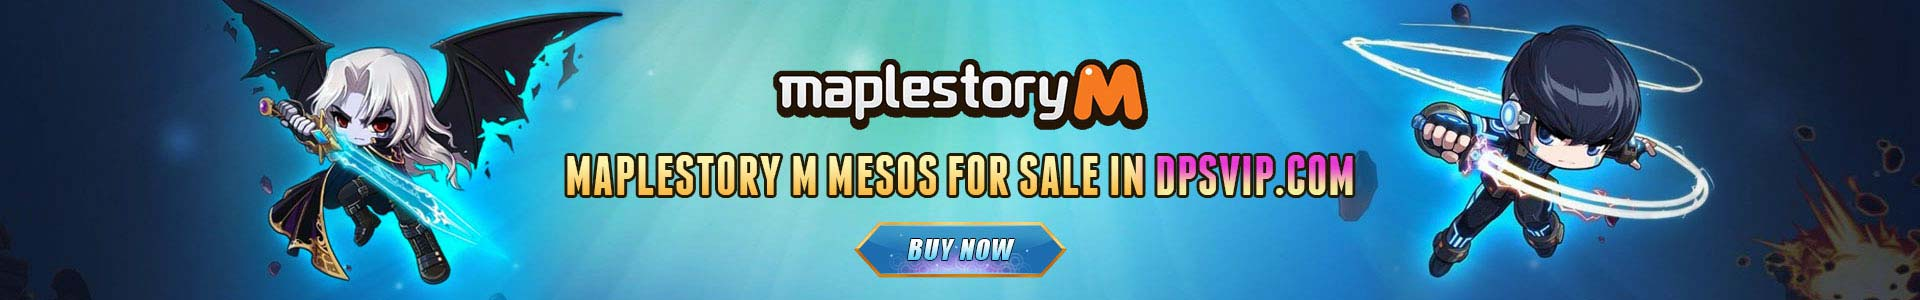 Maplestory M Mesos